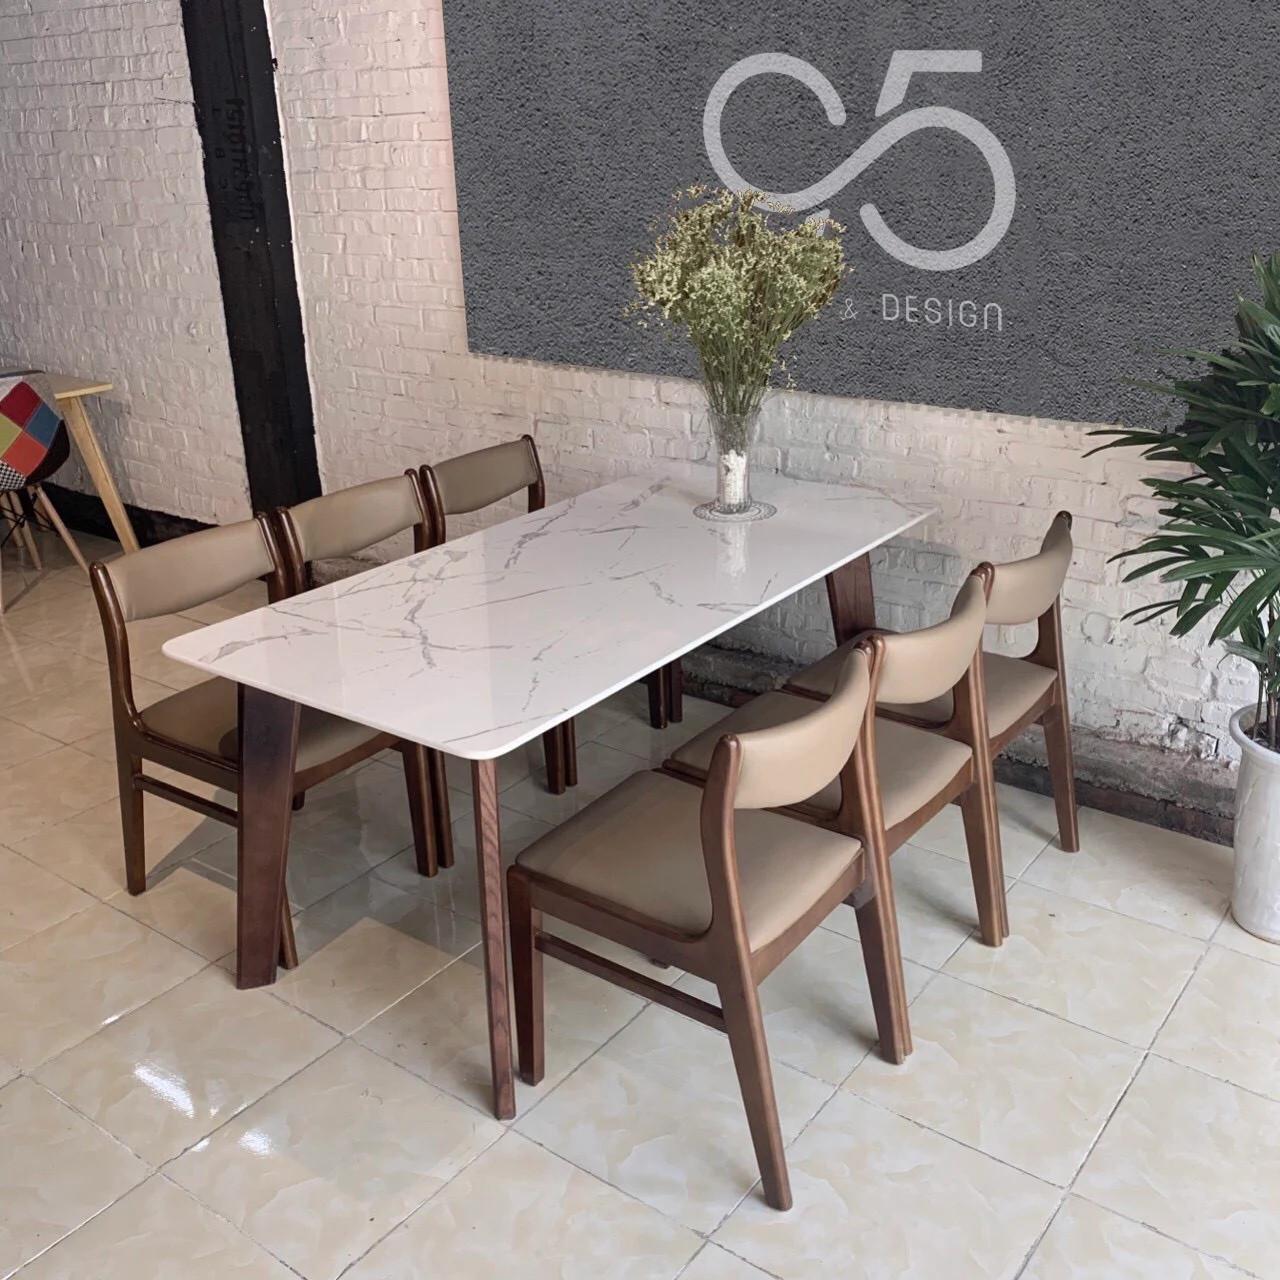 Bộ-bàn-ăn-mặt-đá-chân-gỗ-Howard-6-ghế-gỗ-Bella